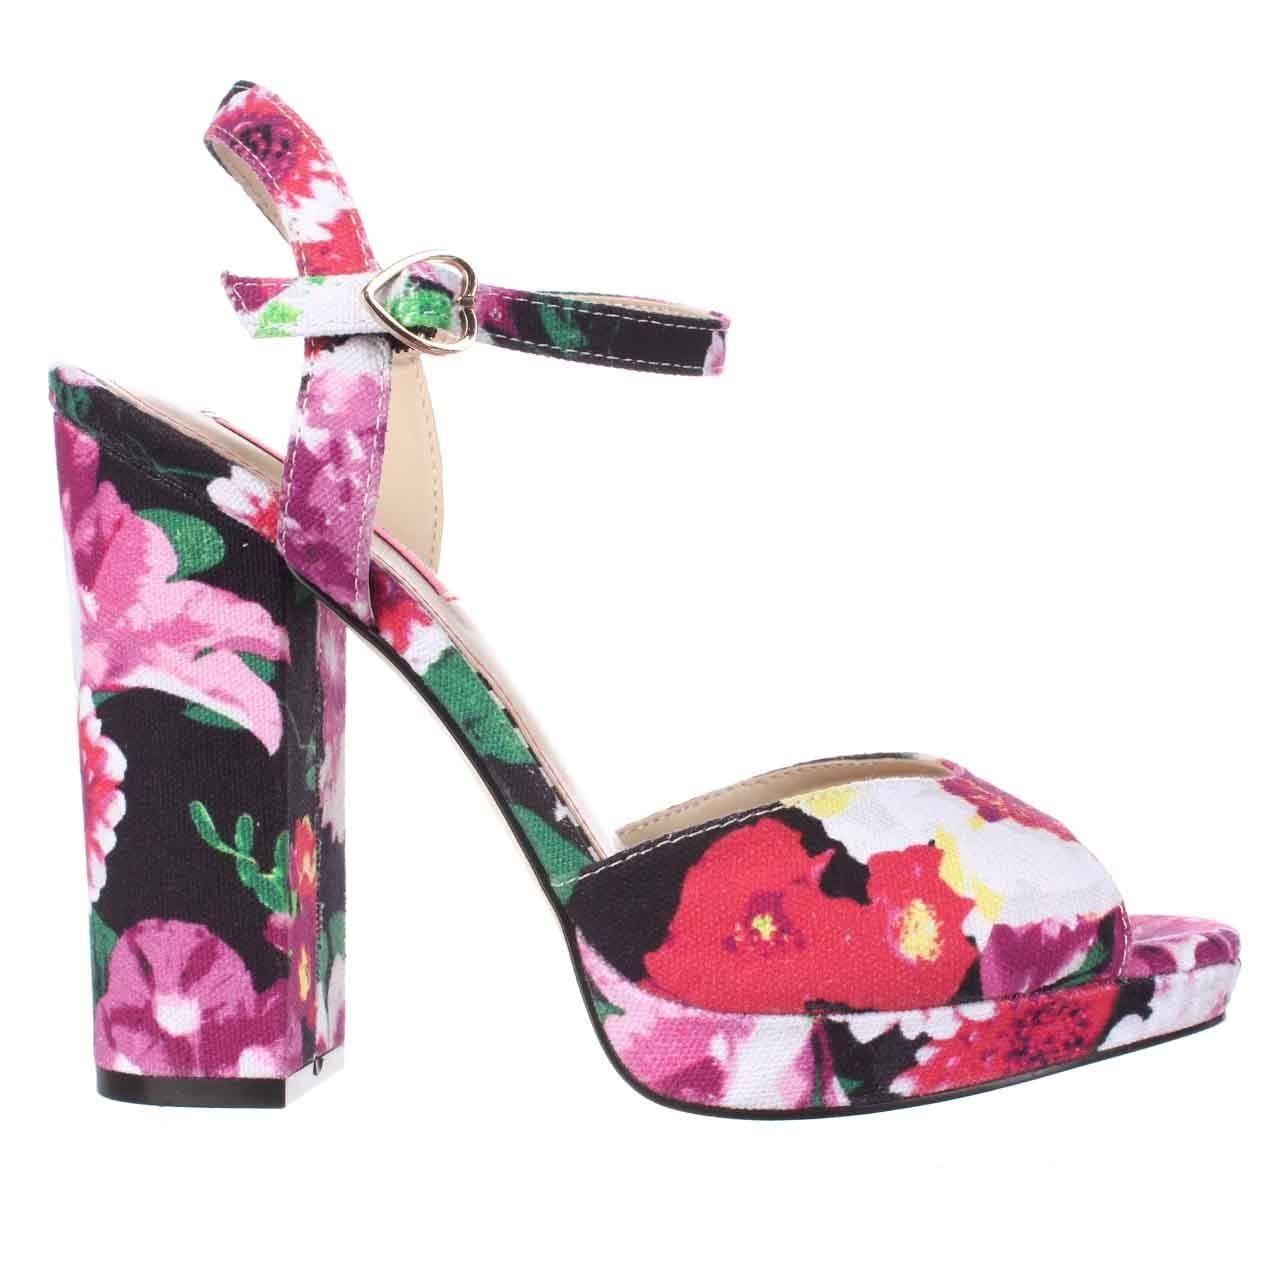 66b924cc5b6 Betsey Johnson Isla Ankle Strap Dress Sandals